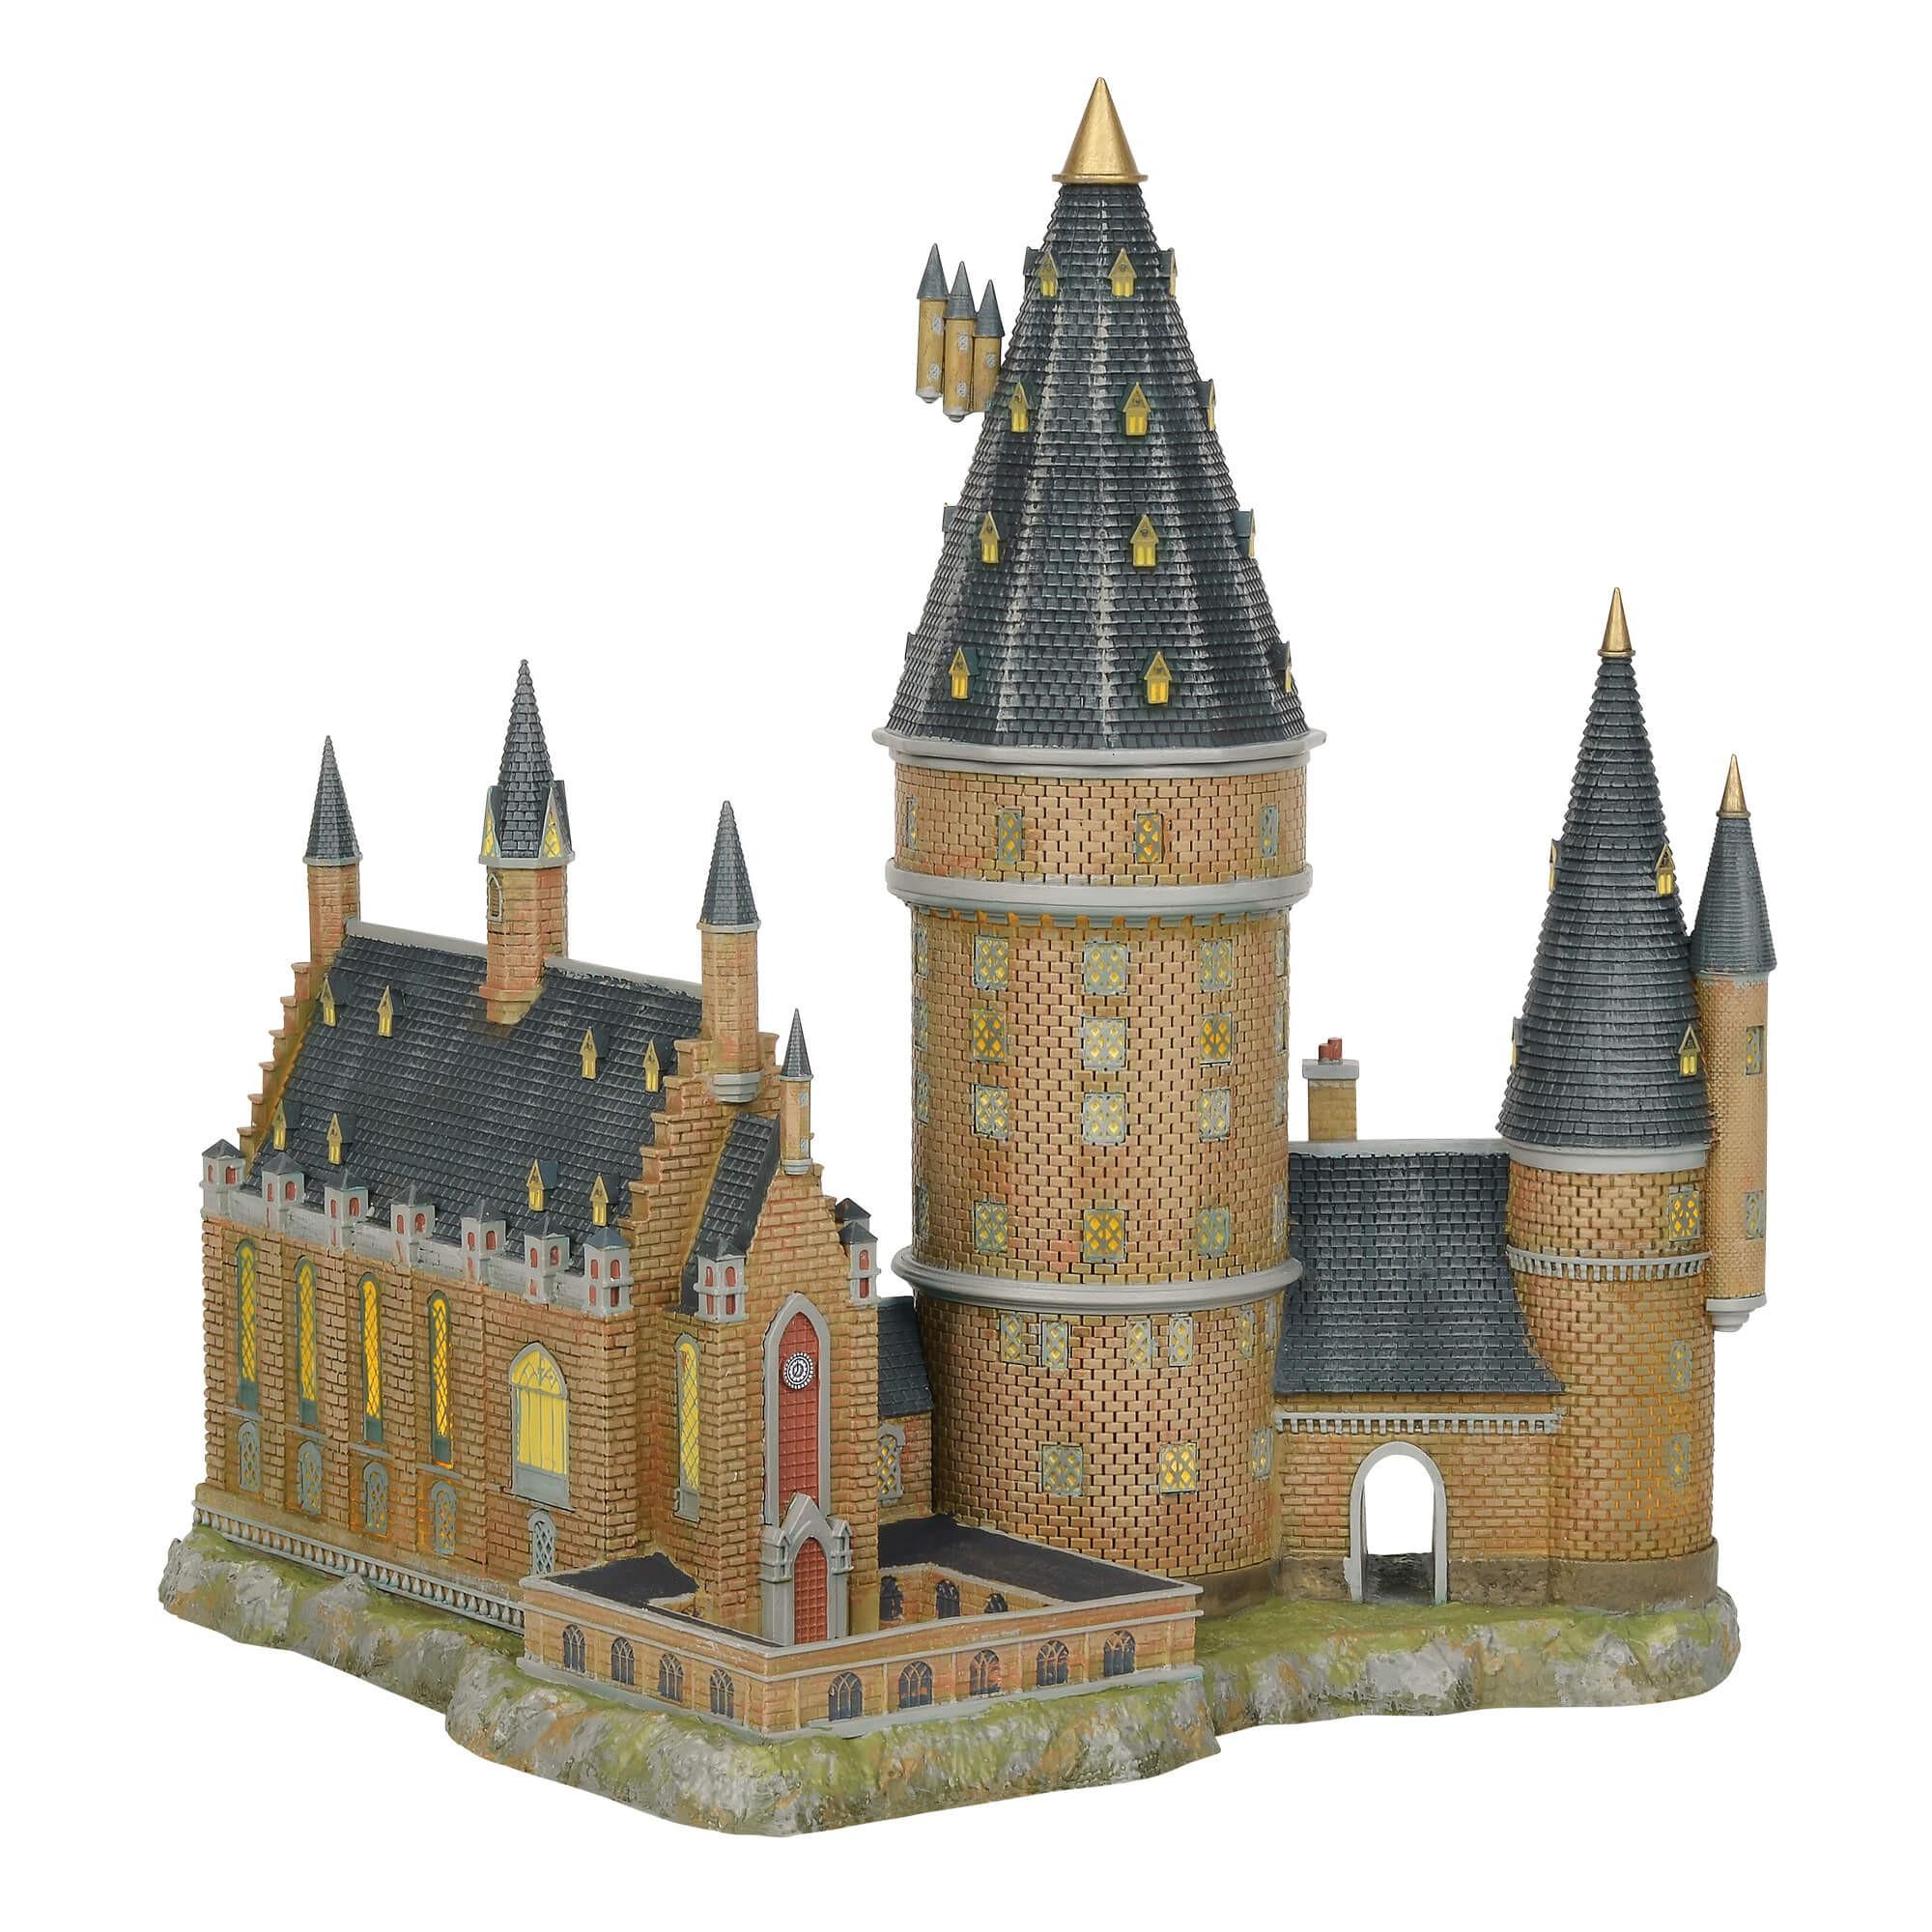 【Department 56】ハリーポッター ホグワーツ魔法魔術学校 大広間&天文台